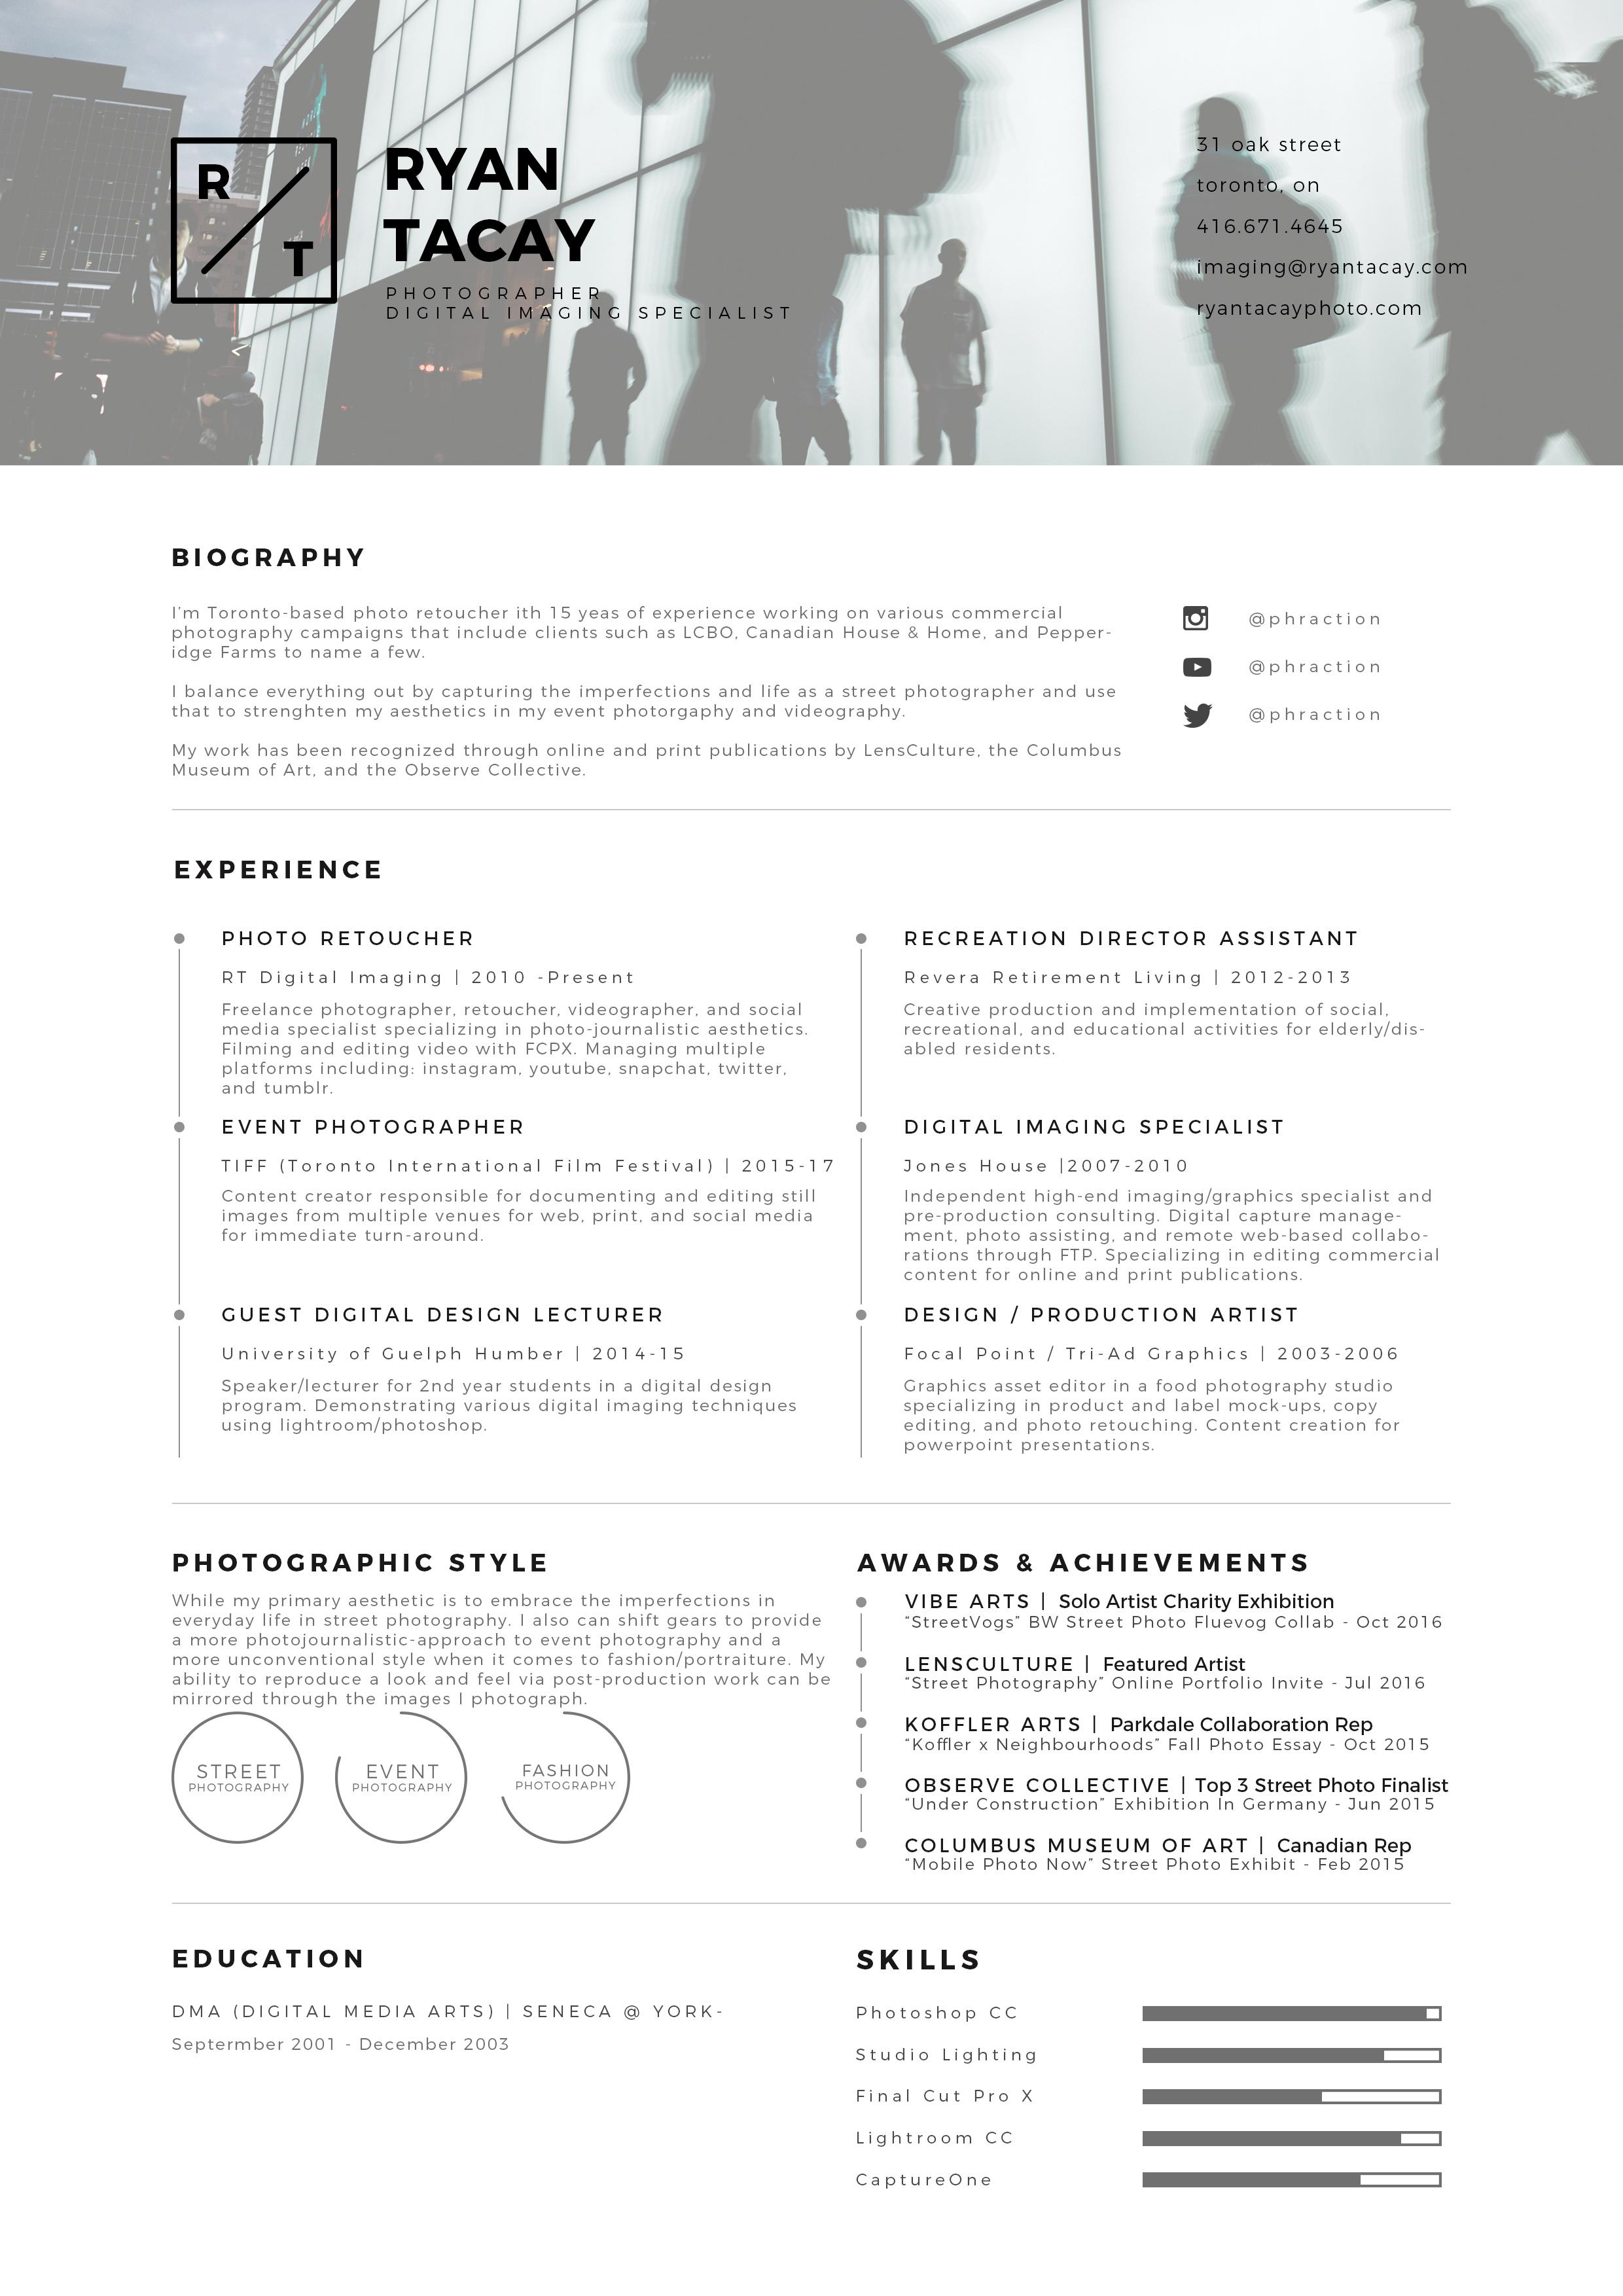 Tacay_Ryan_Minimal_Media_Resume_2017.jpg